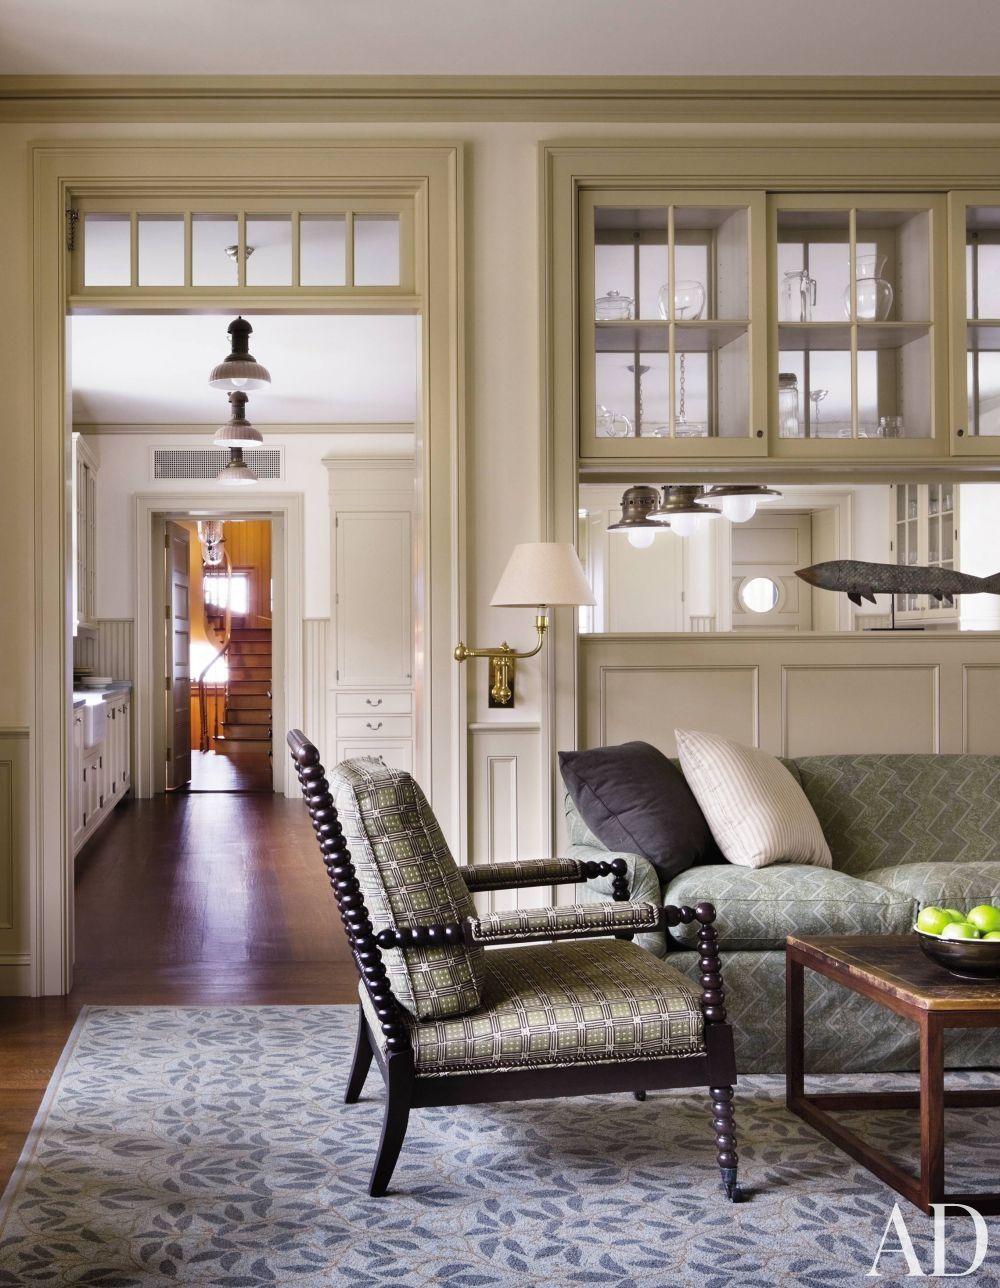 Beach Living Room By Victoria Hagan Interiors Via Archdigest Designfile Beach Living Room Classic House Home Decor